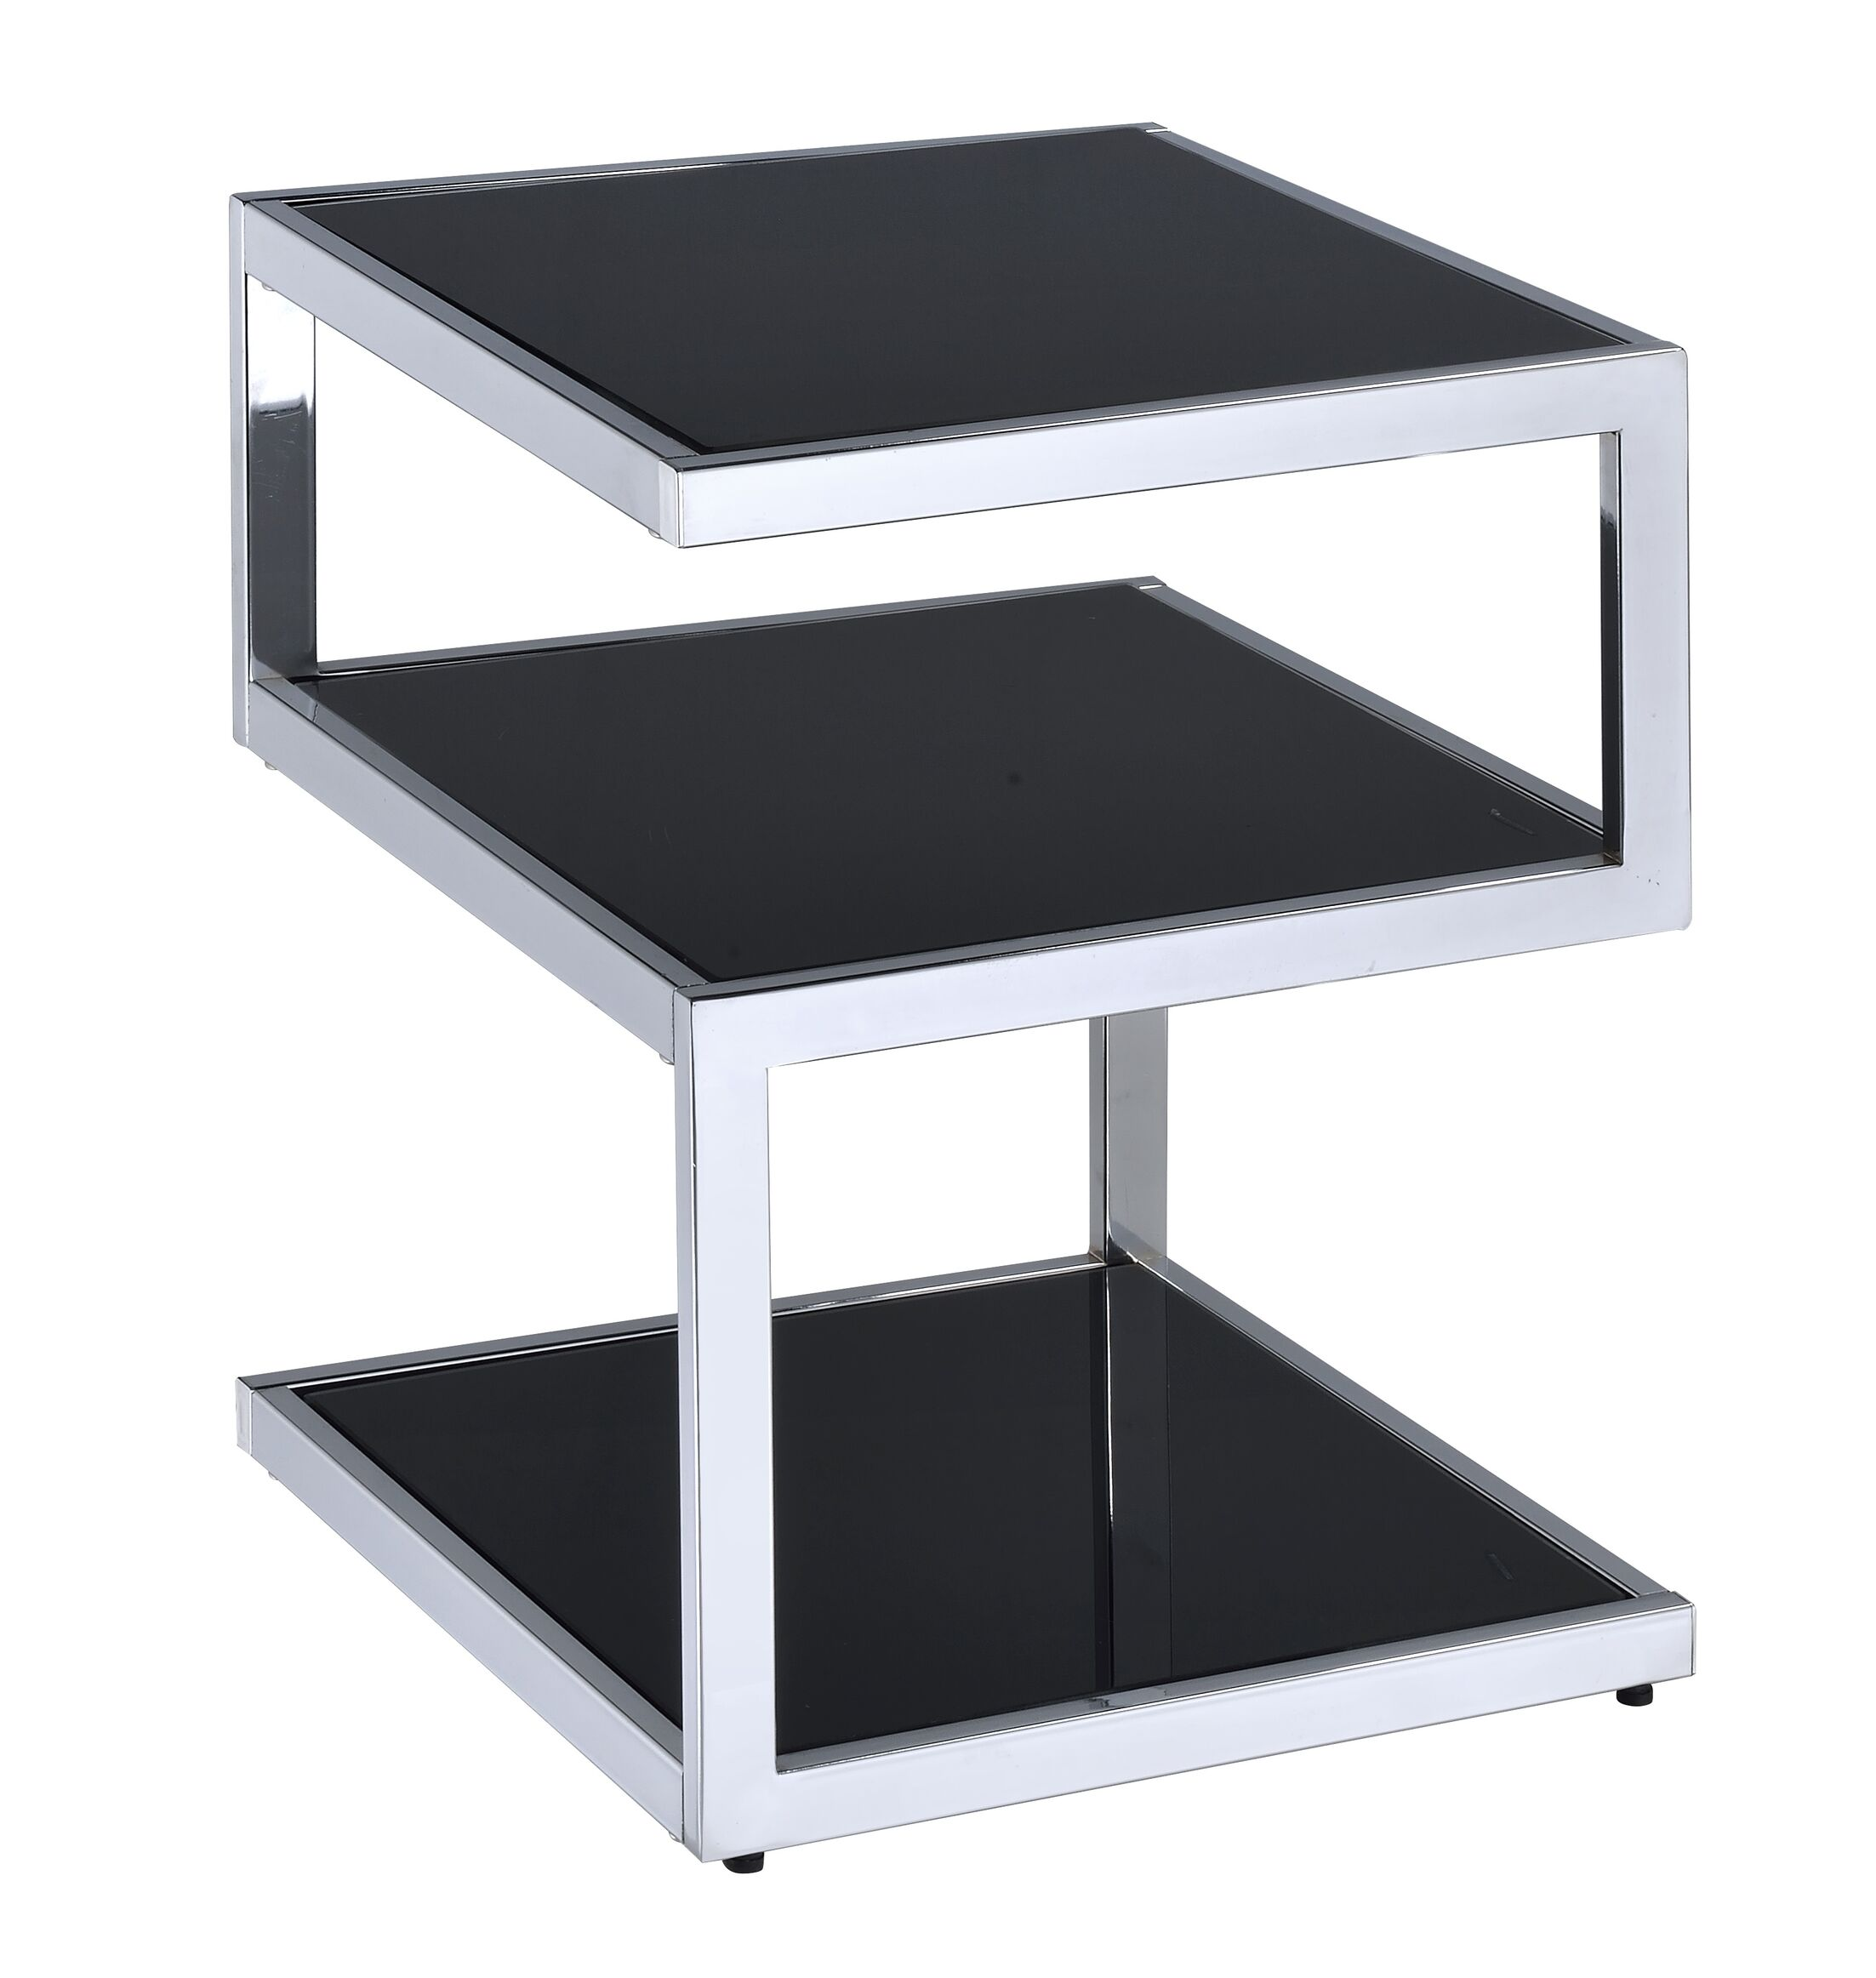 Miraloma End Table Color: Black Glass/Chrome